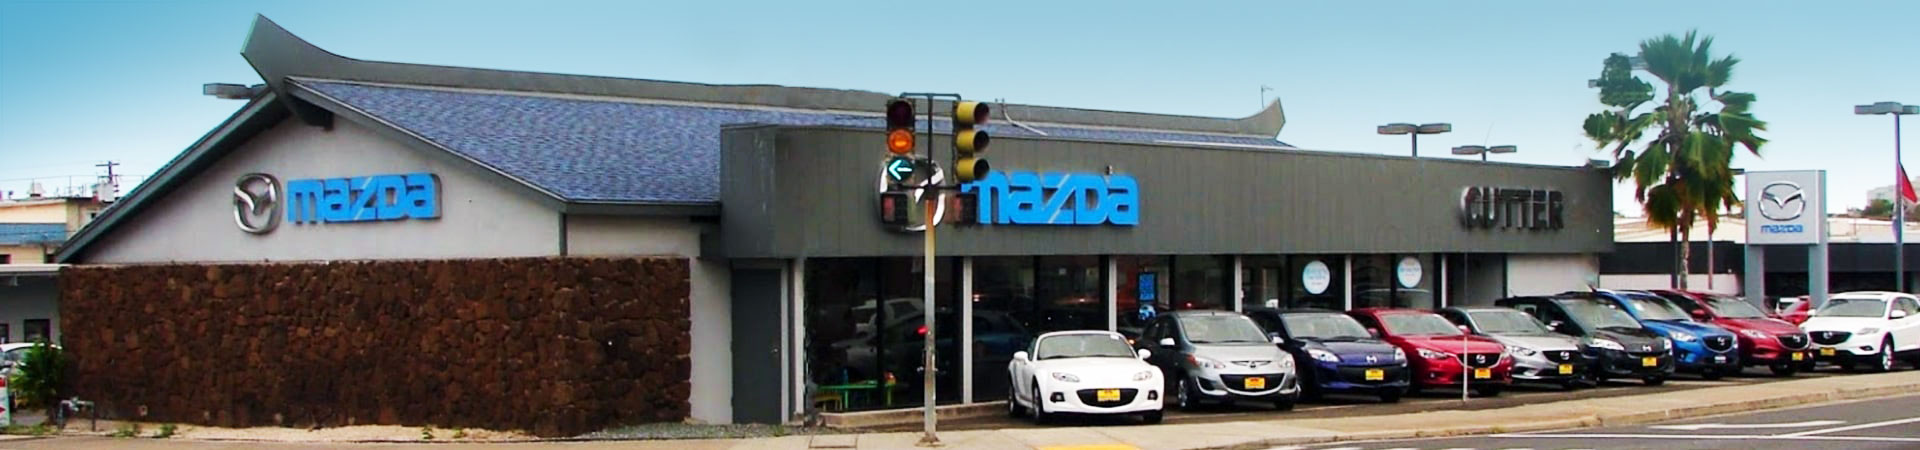 Waipahu Hawaii Mazda service special coupons